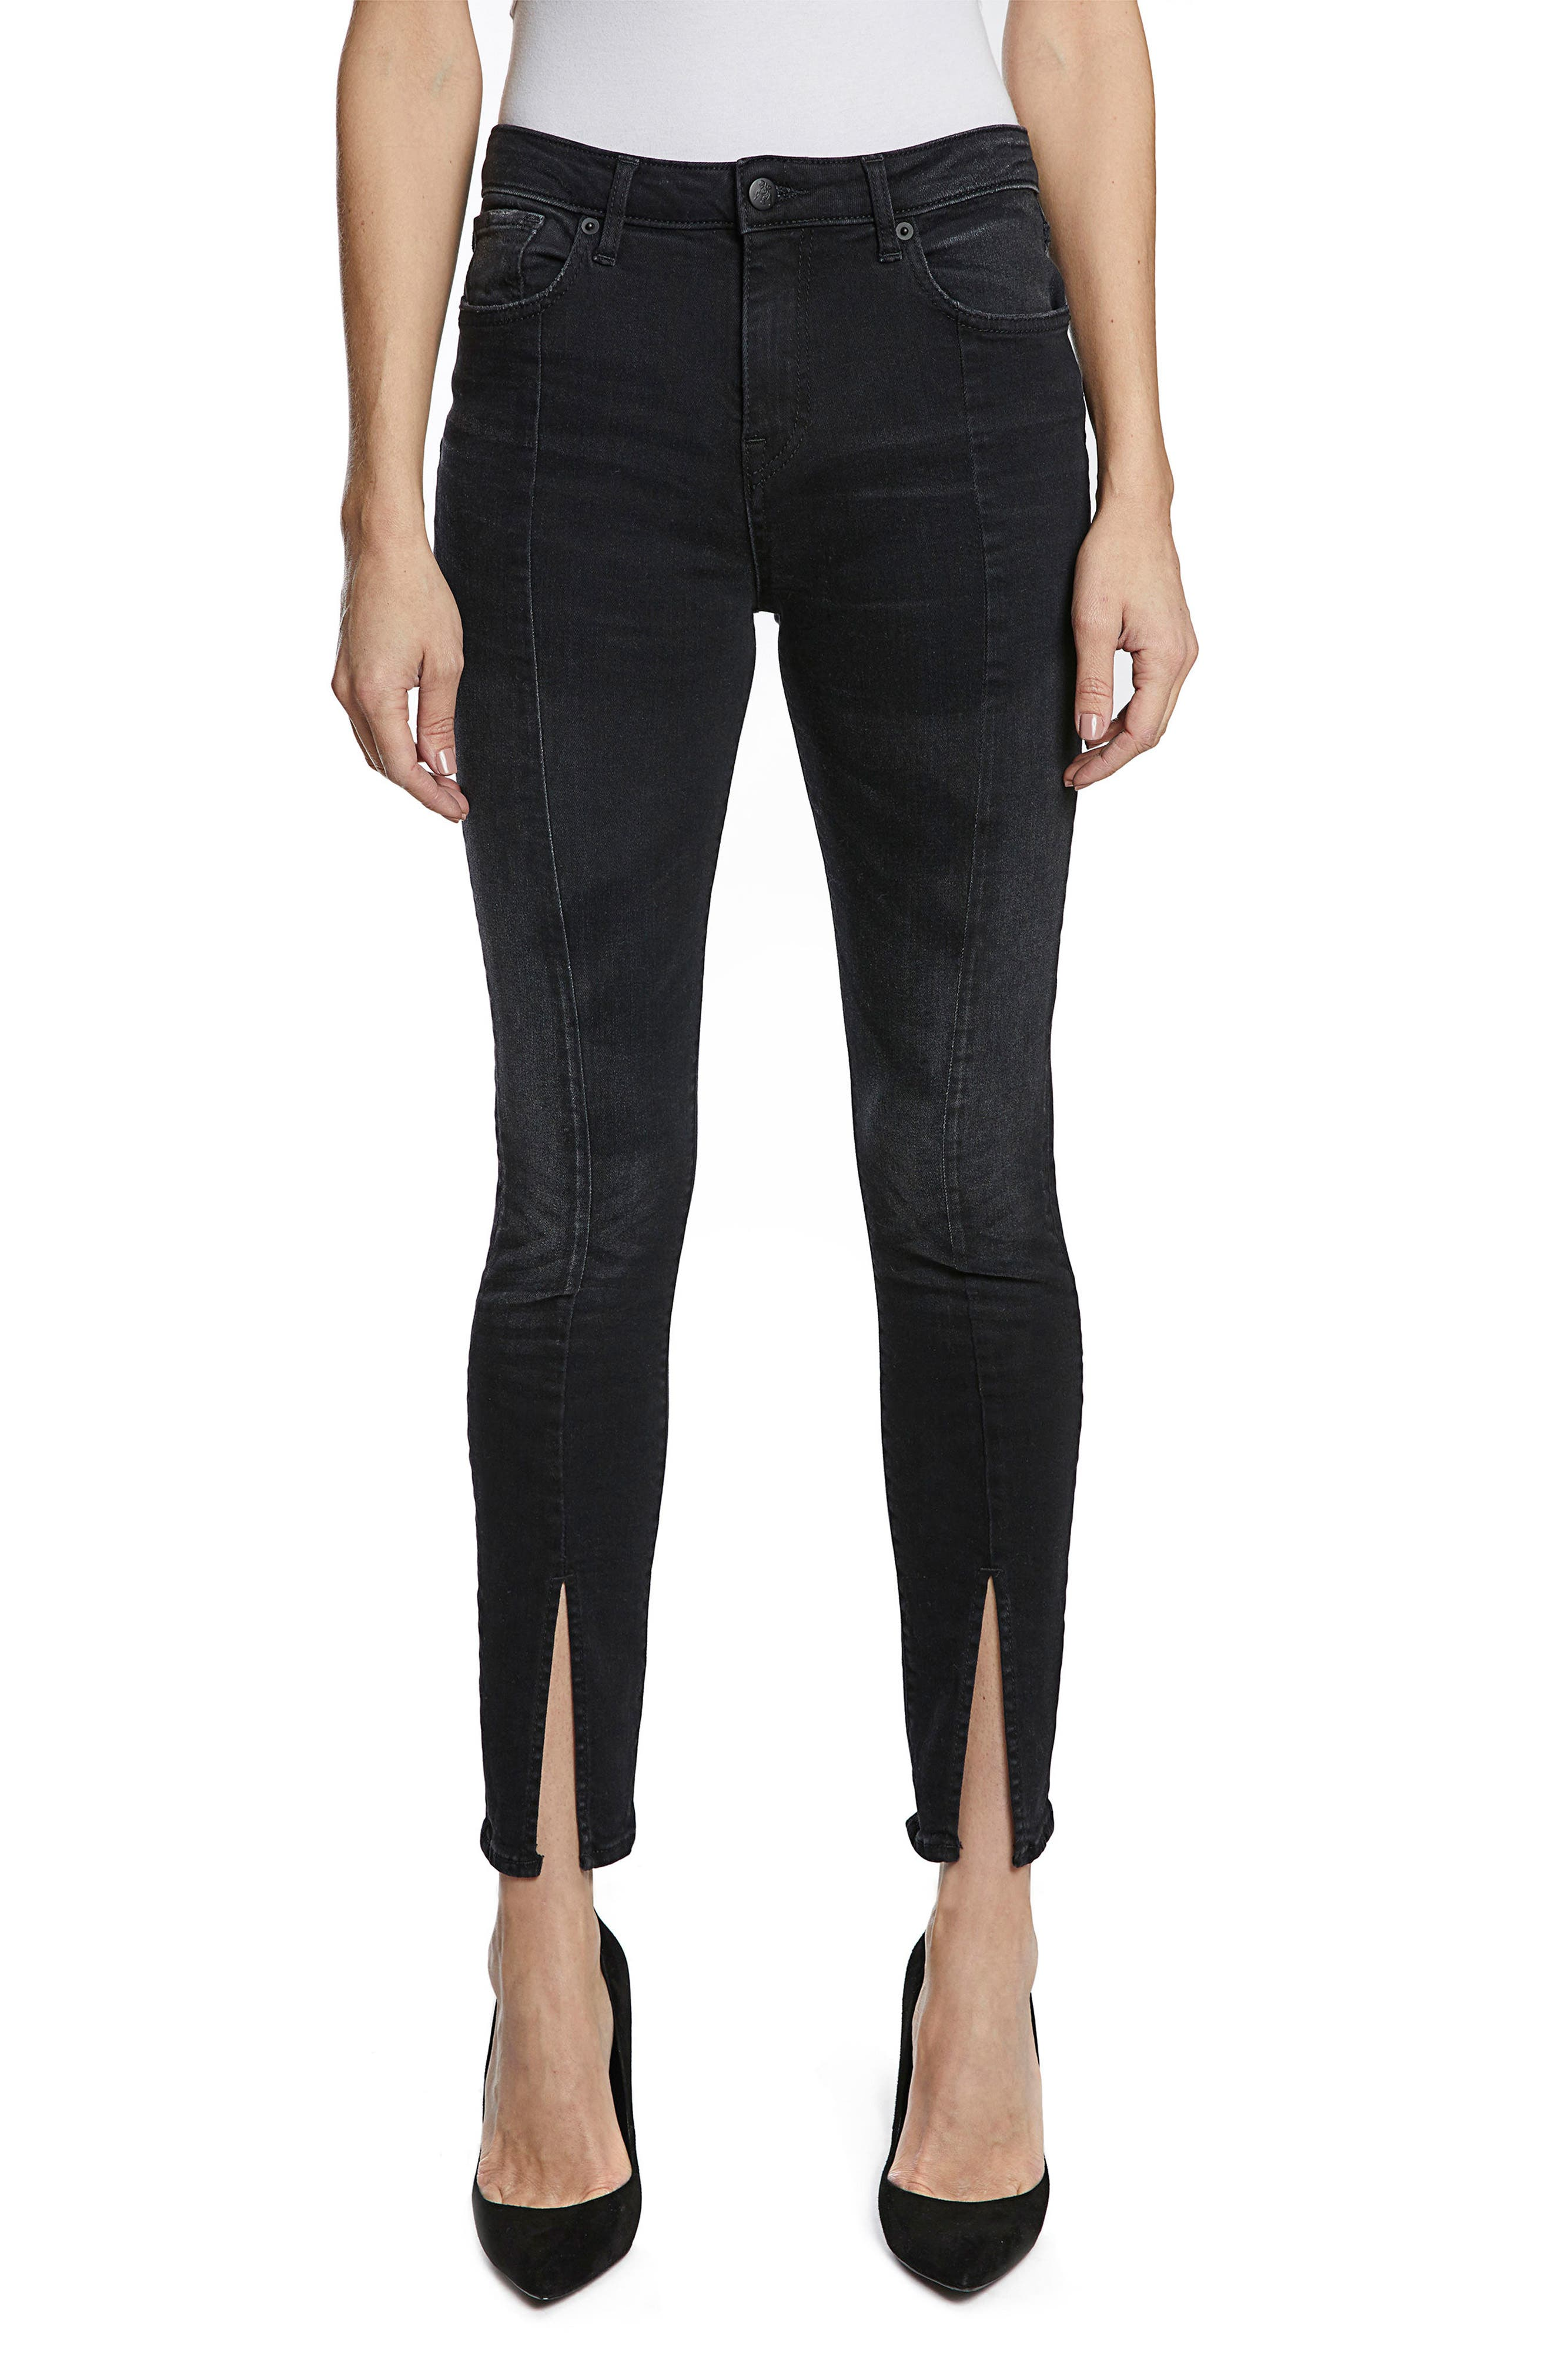 Chevelle Split Ankle Skinny Jeans,                             Main thumbnail 1, color,                             Black